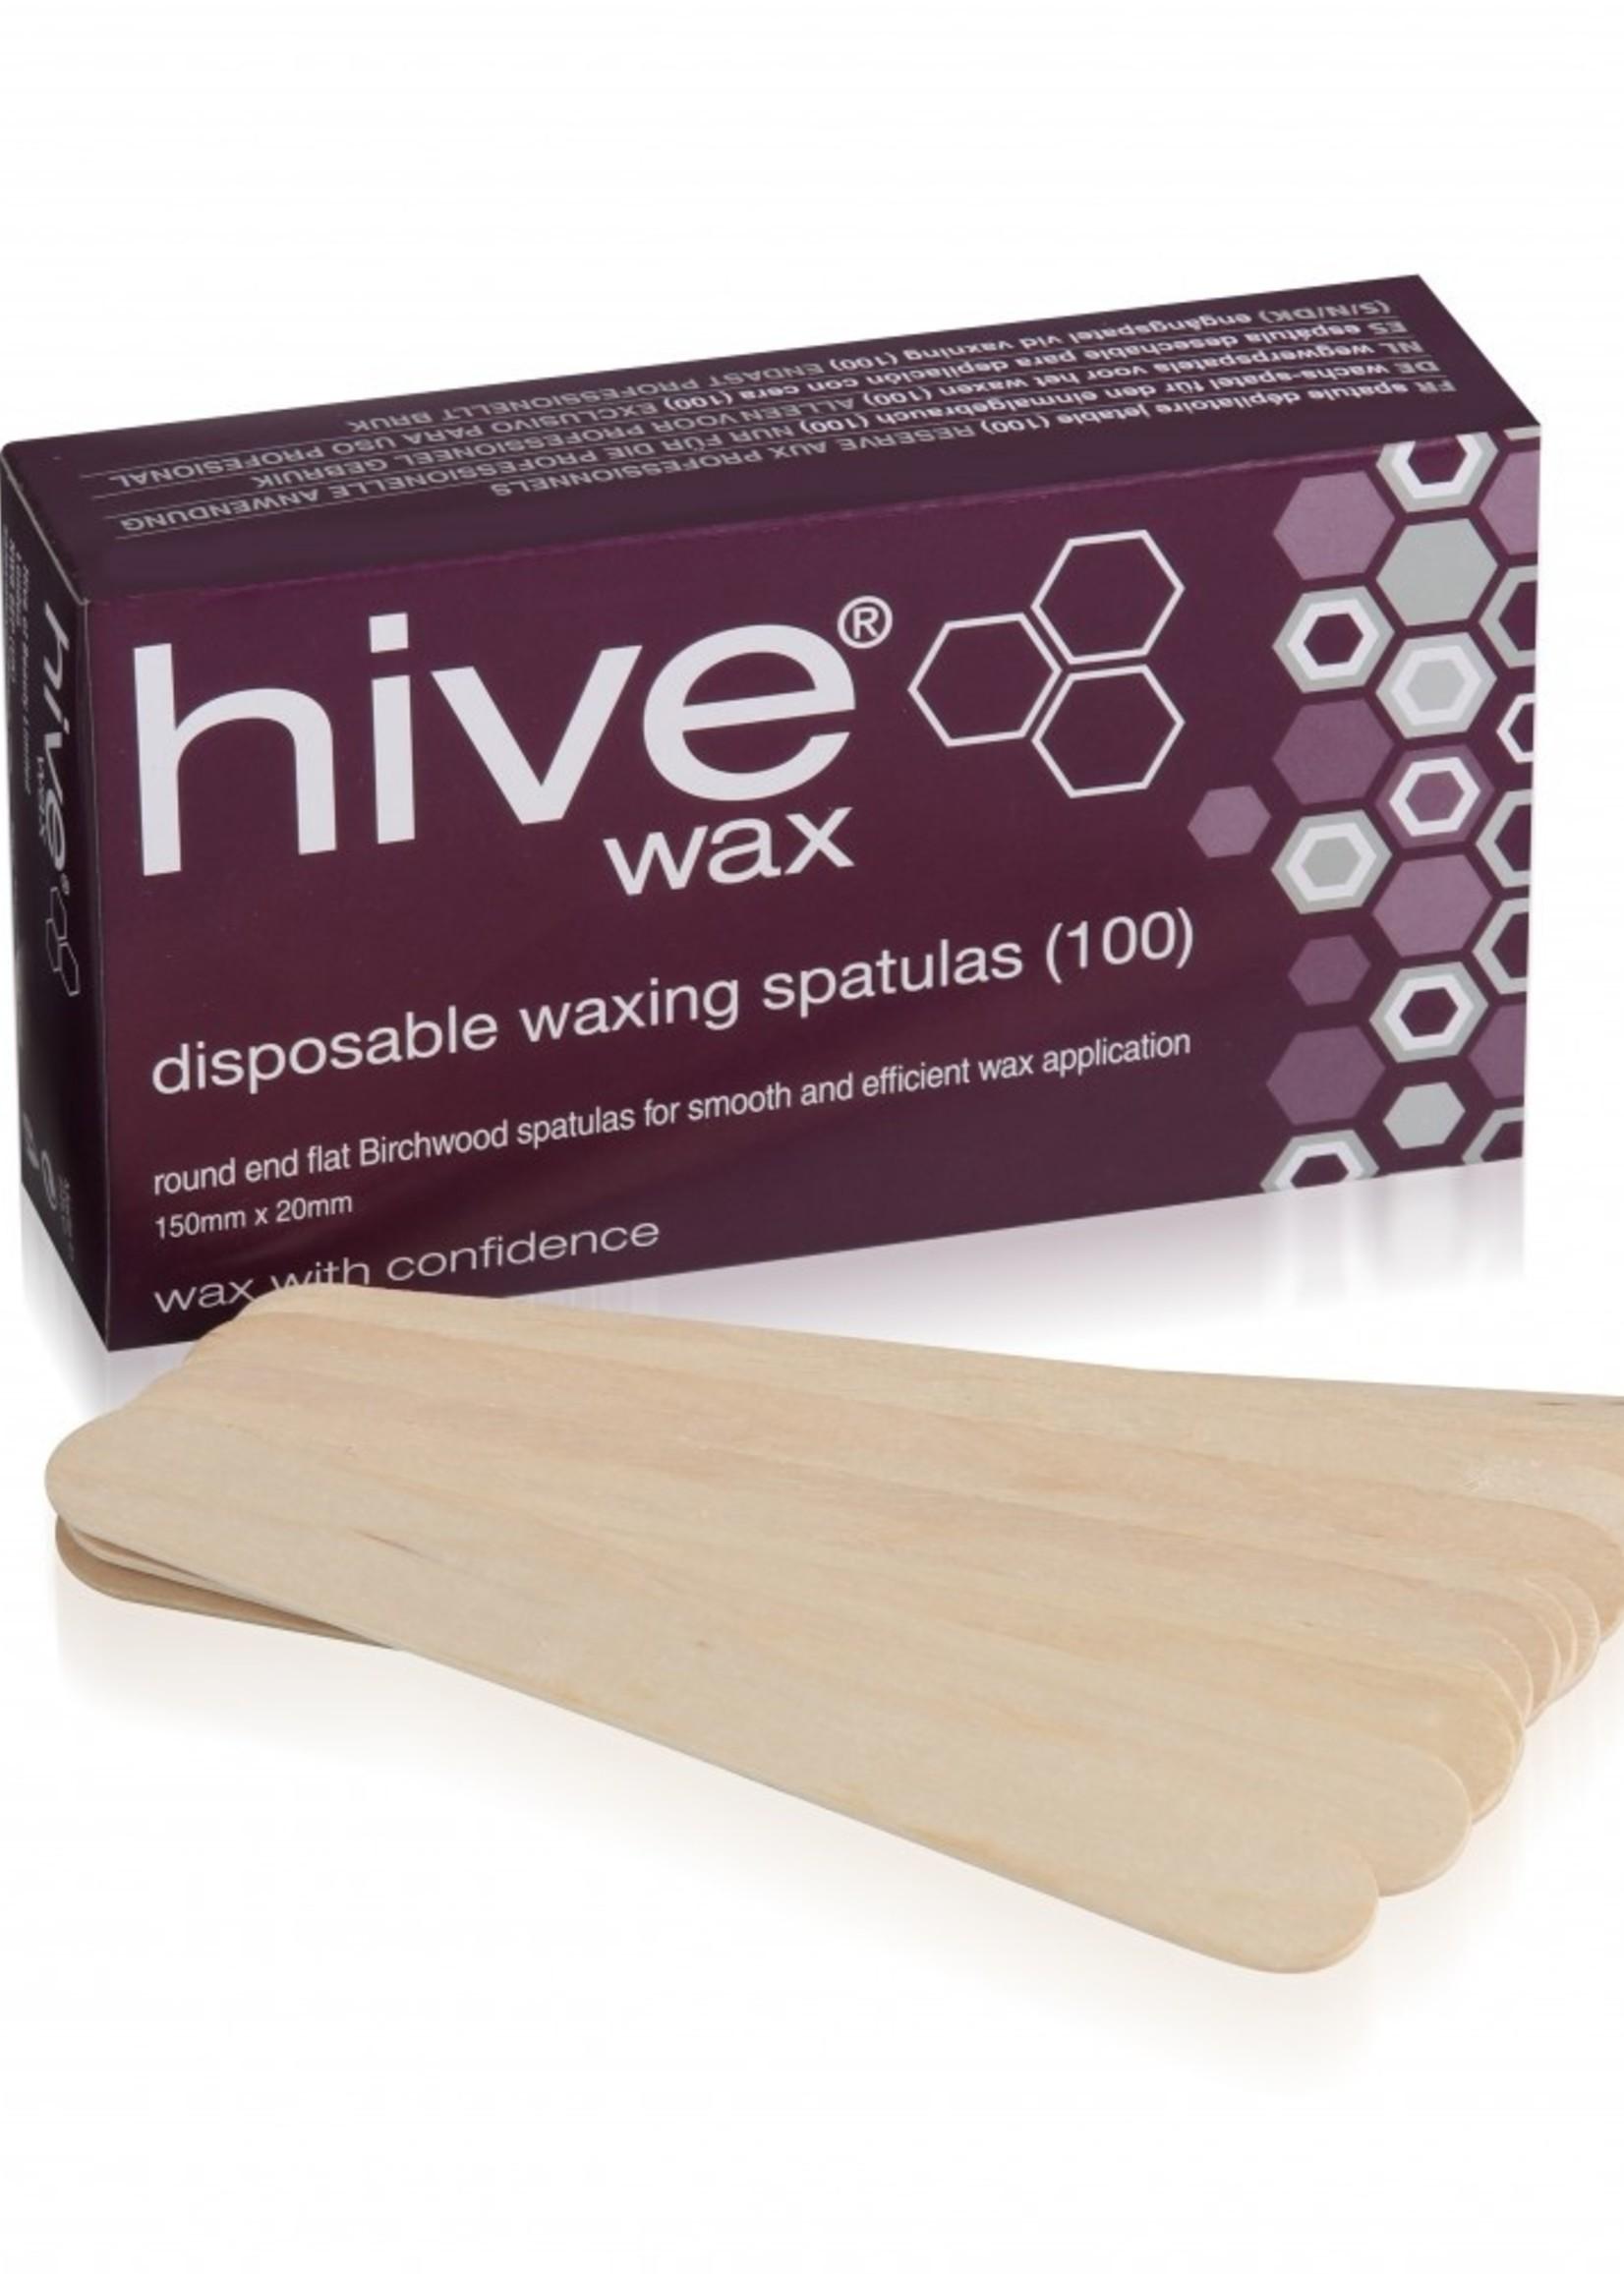 Hive of Beauty Wax Wax Applicator Spatulas  2cm 100 pieces